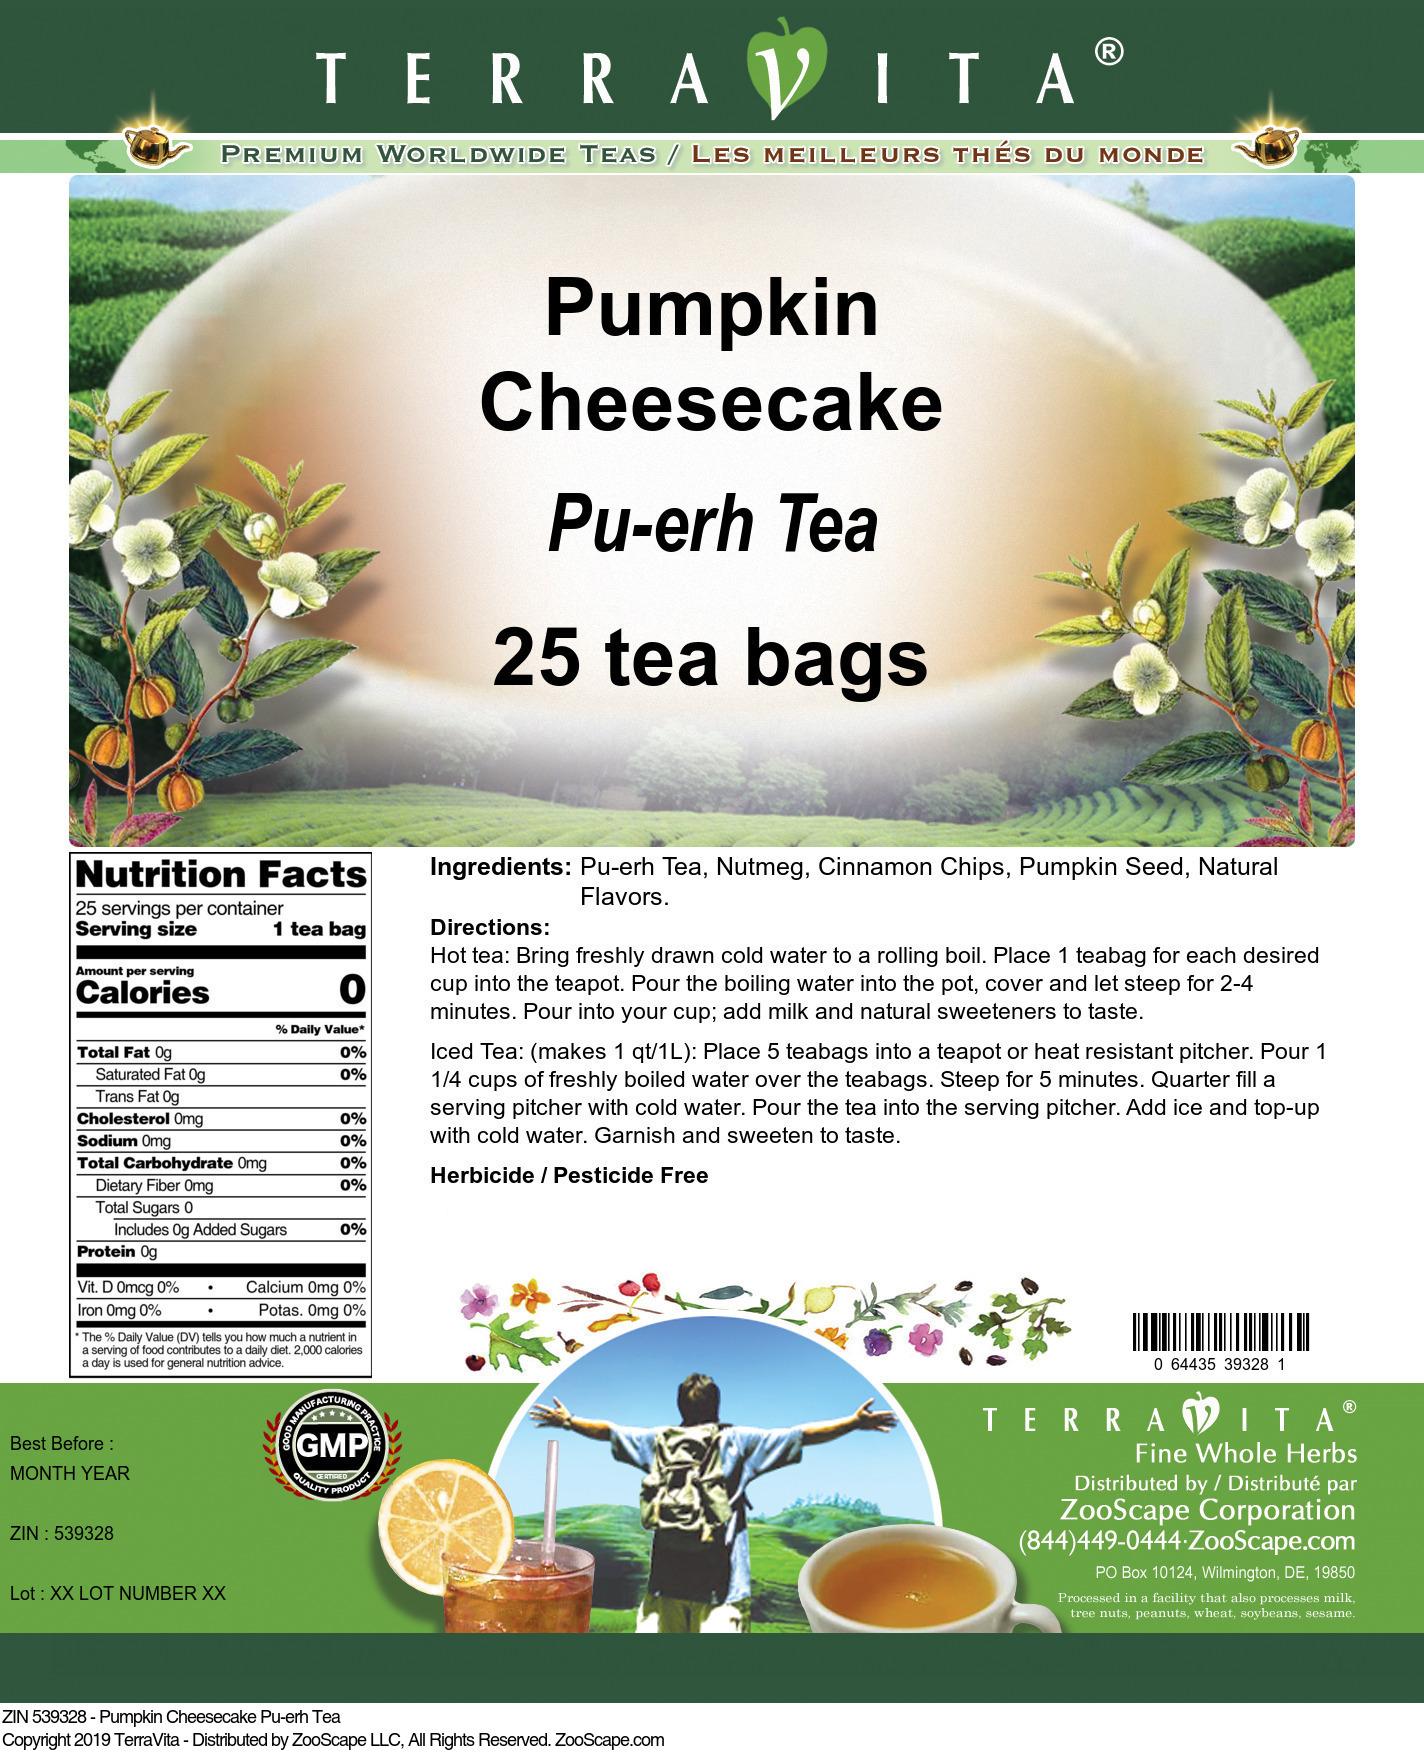 Pumpkin Cheesecake Pu-erh Tea